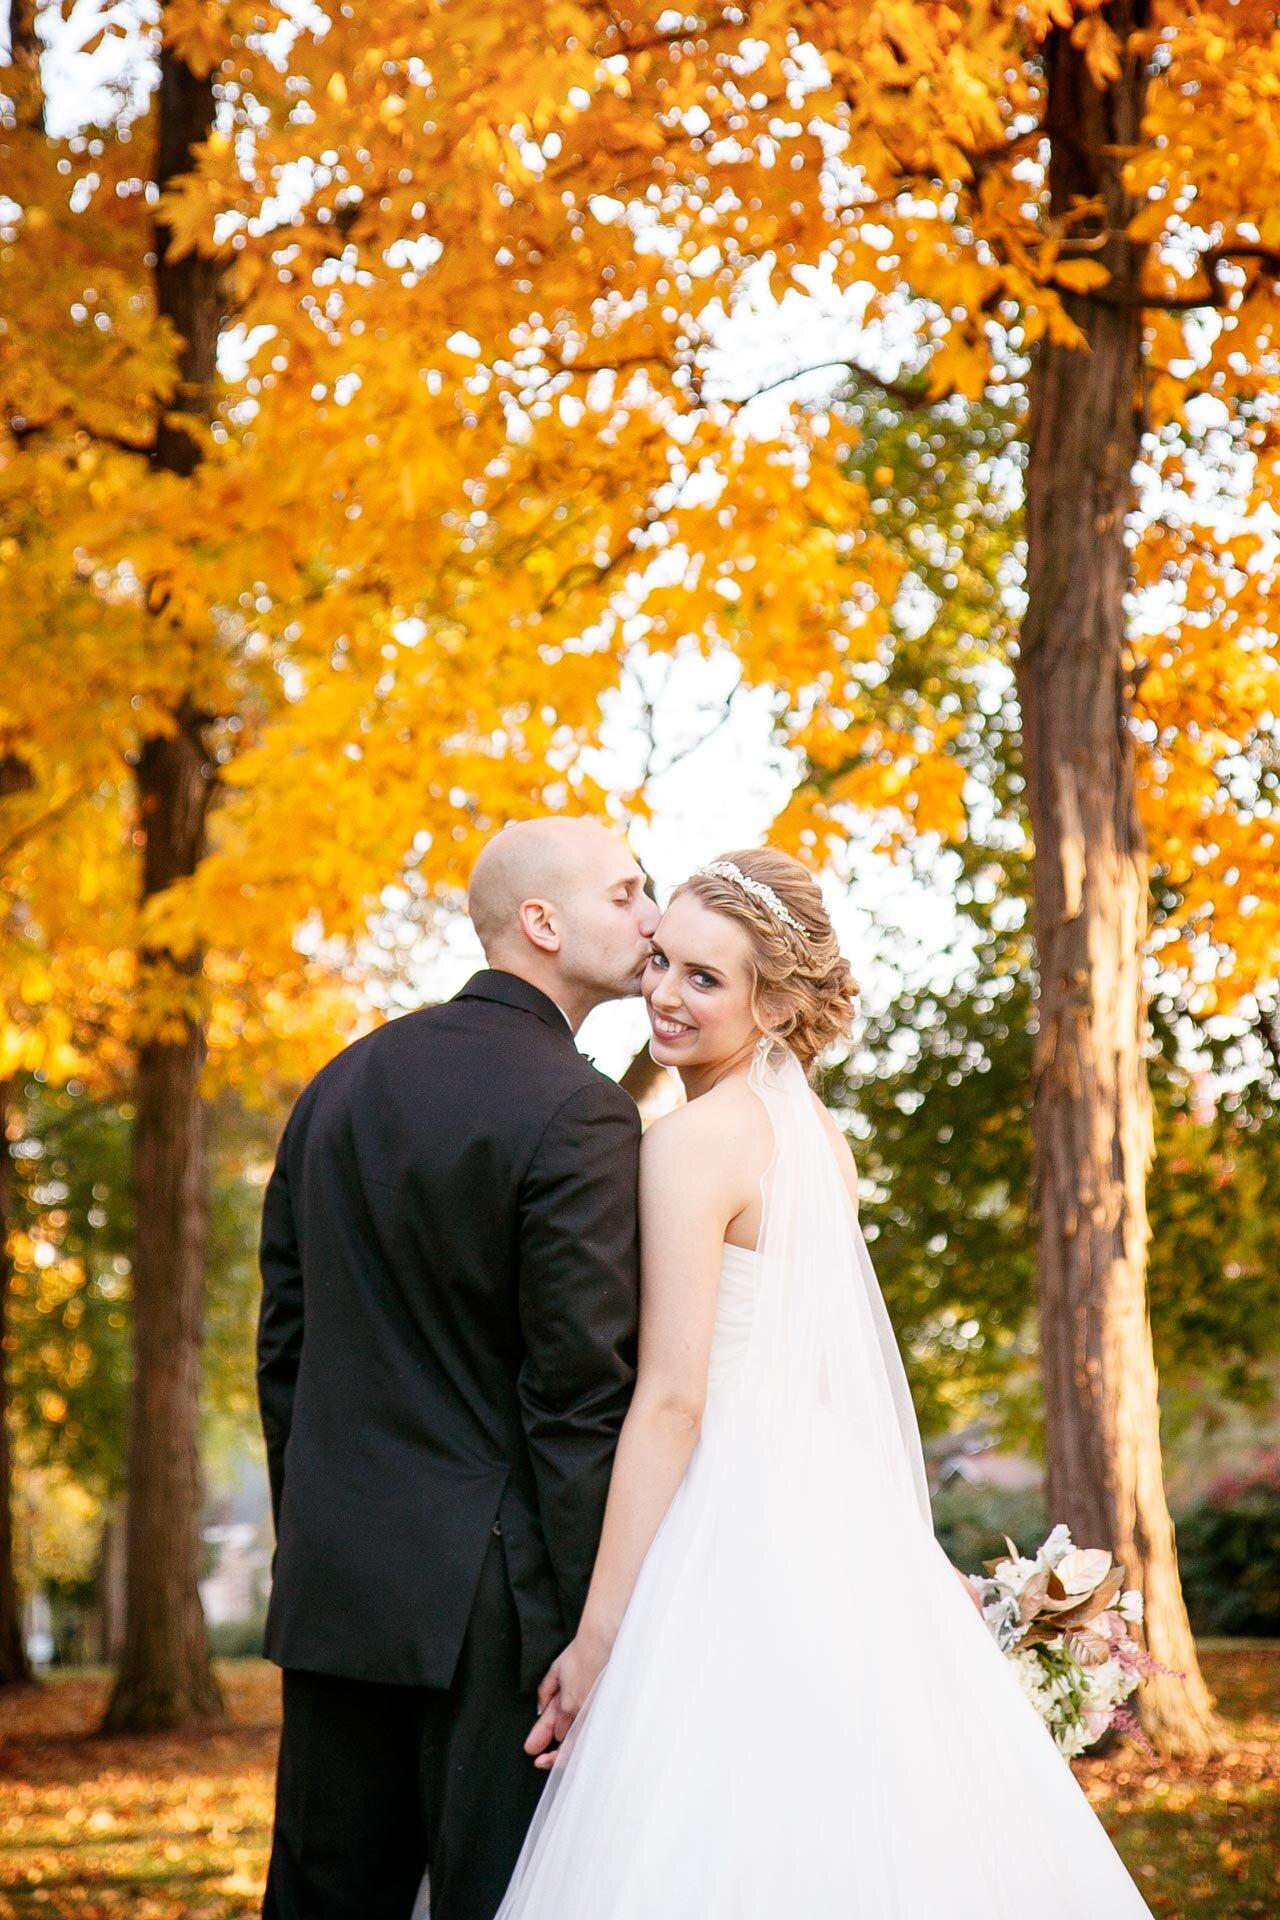 autumn-lighting-afternoon-colors-adam-shea-photography-green-bay-wisconsin-neenah-adam-shea-photography-green-bay-appleton-neenah-photographer-11.jpg